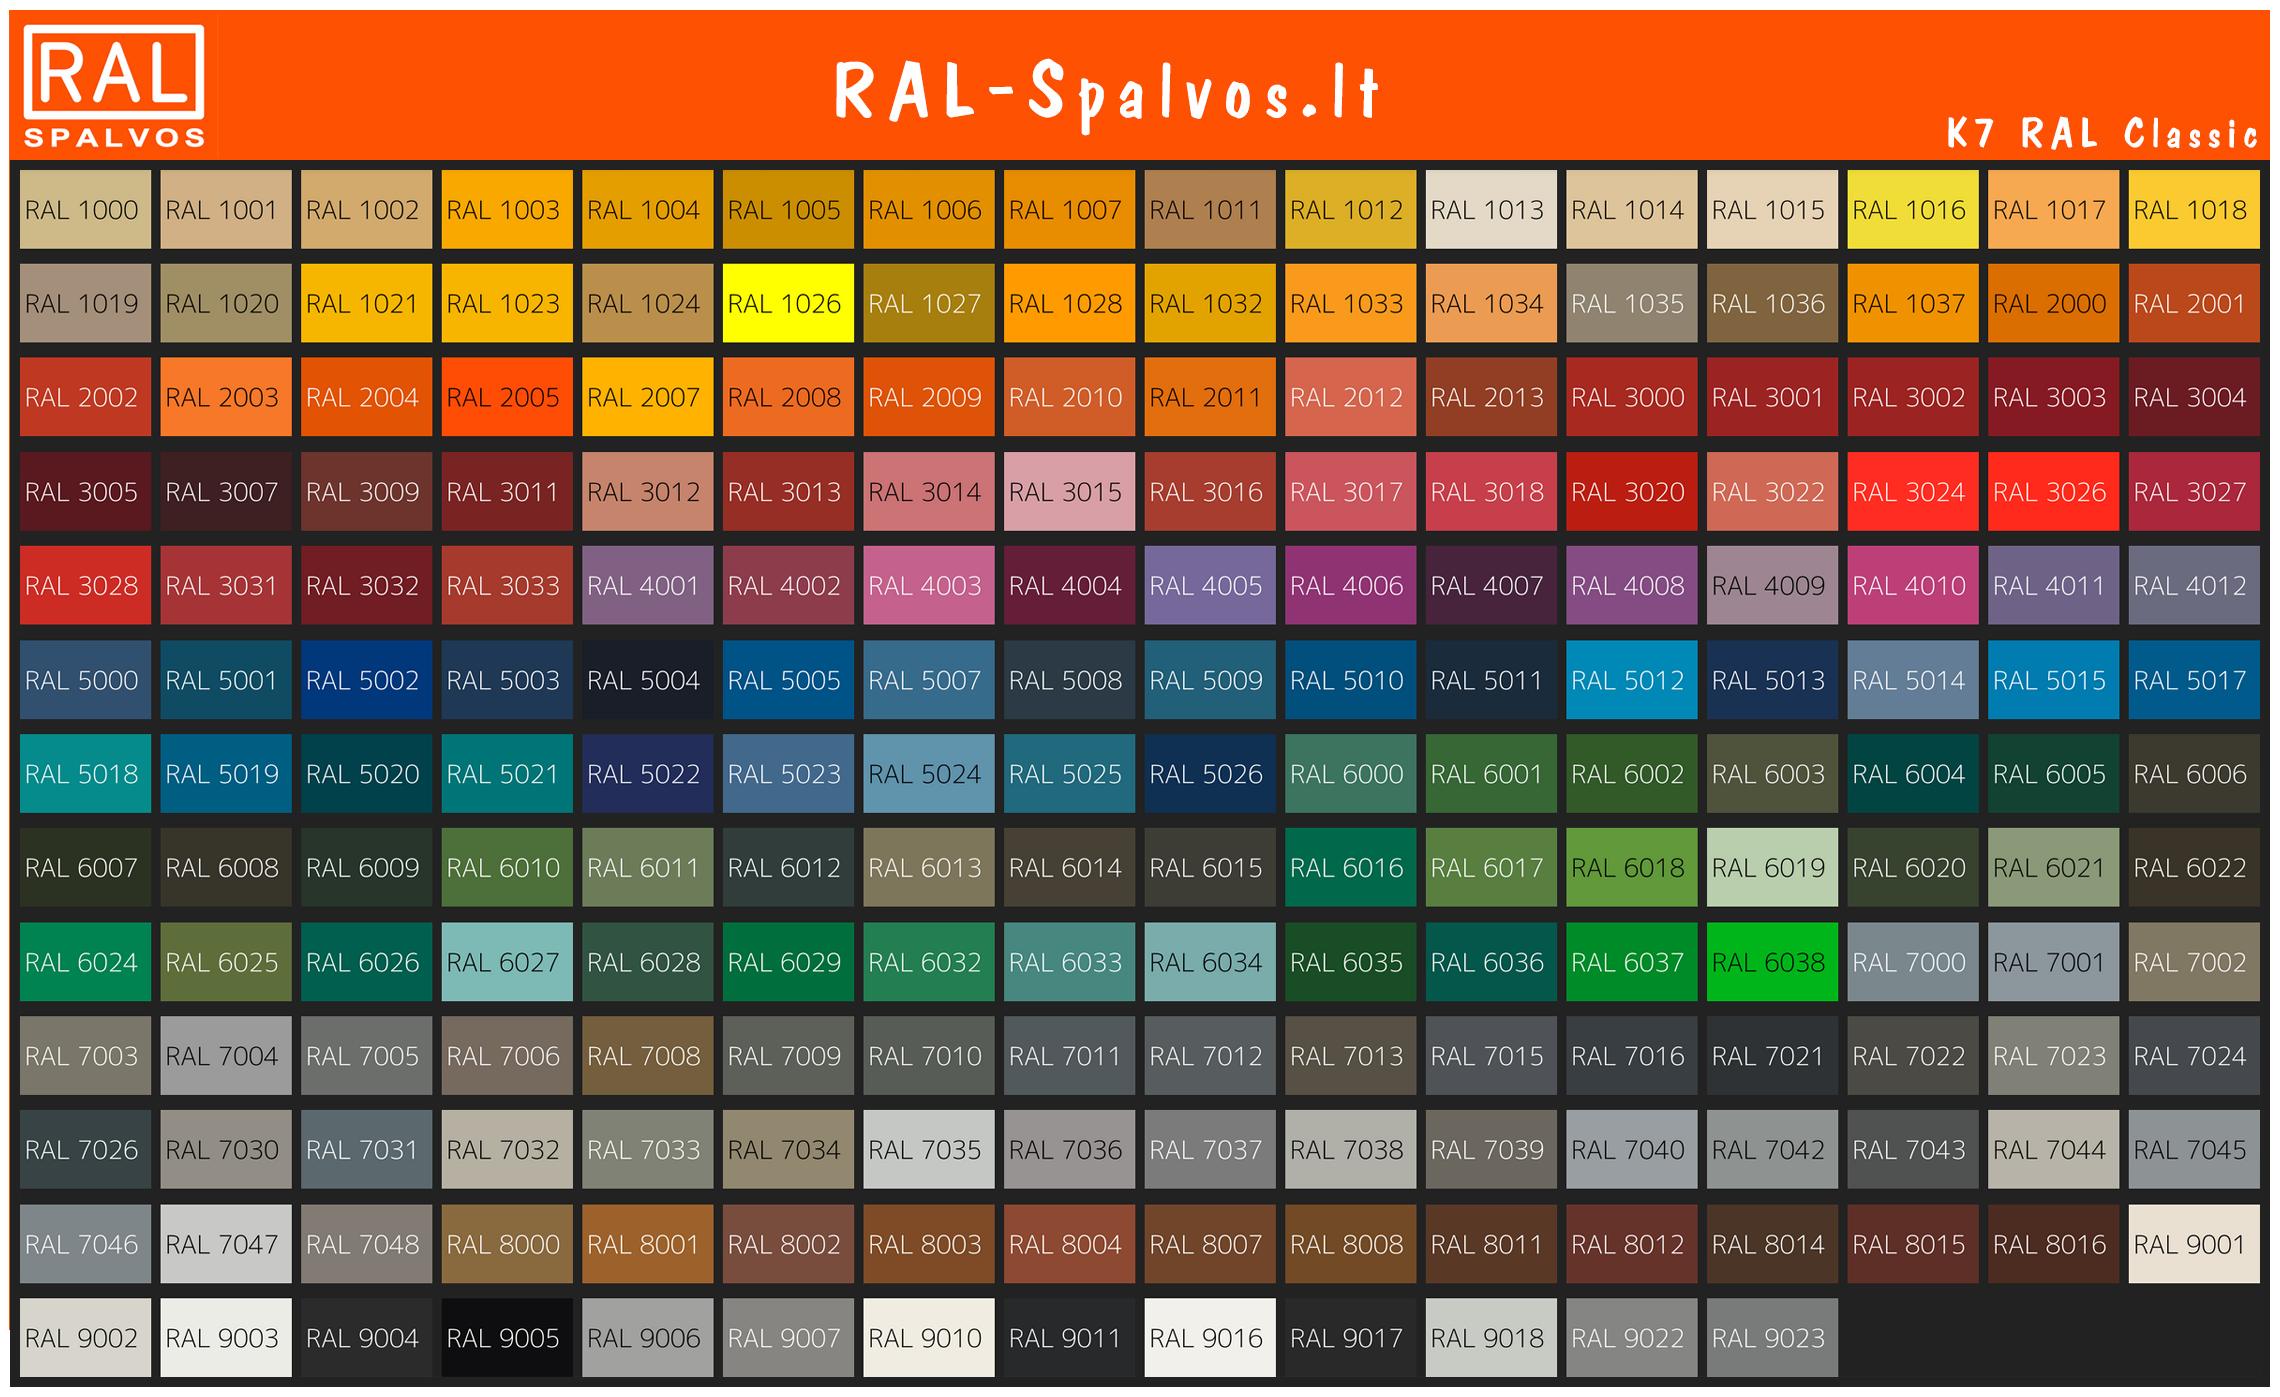 RAL classic spalvos (K7 katalogas)